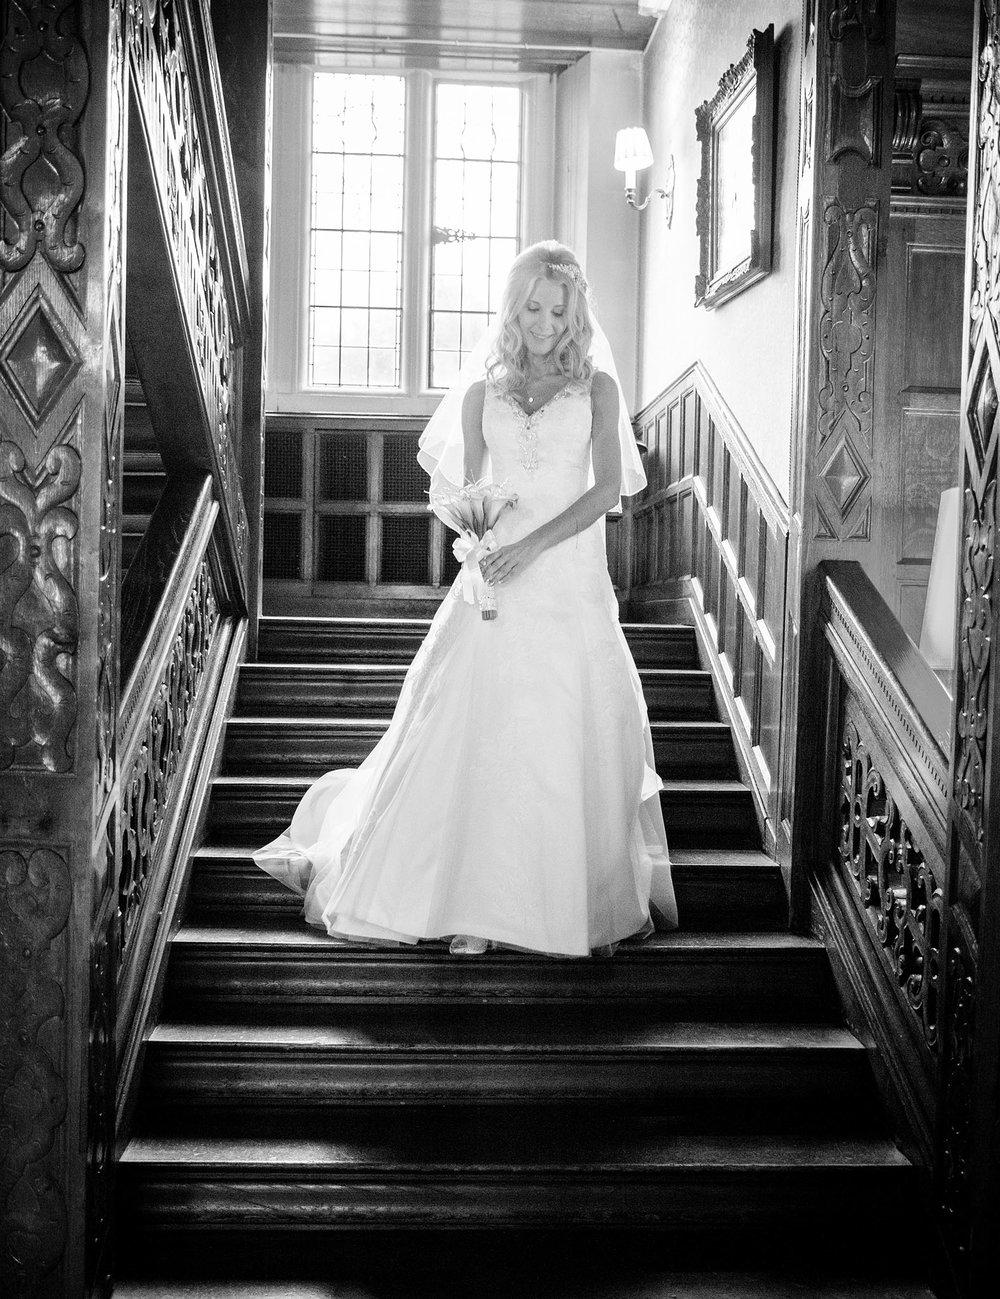 elizabethg_photography_hertfordshire_fineart_photographer_wedding_photography_sandra_lee_hanbury_manor_ware_16.jpg